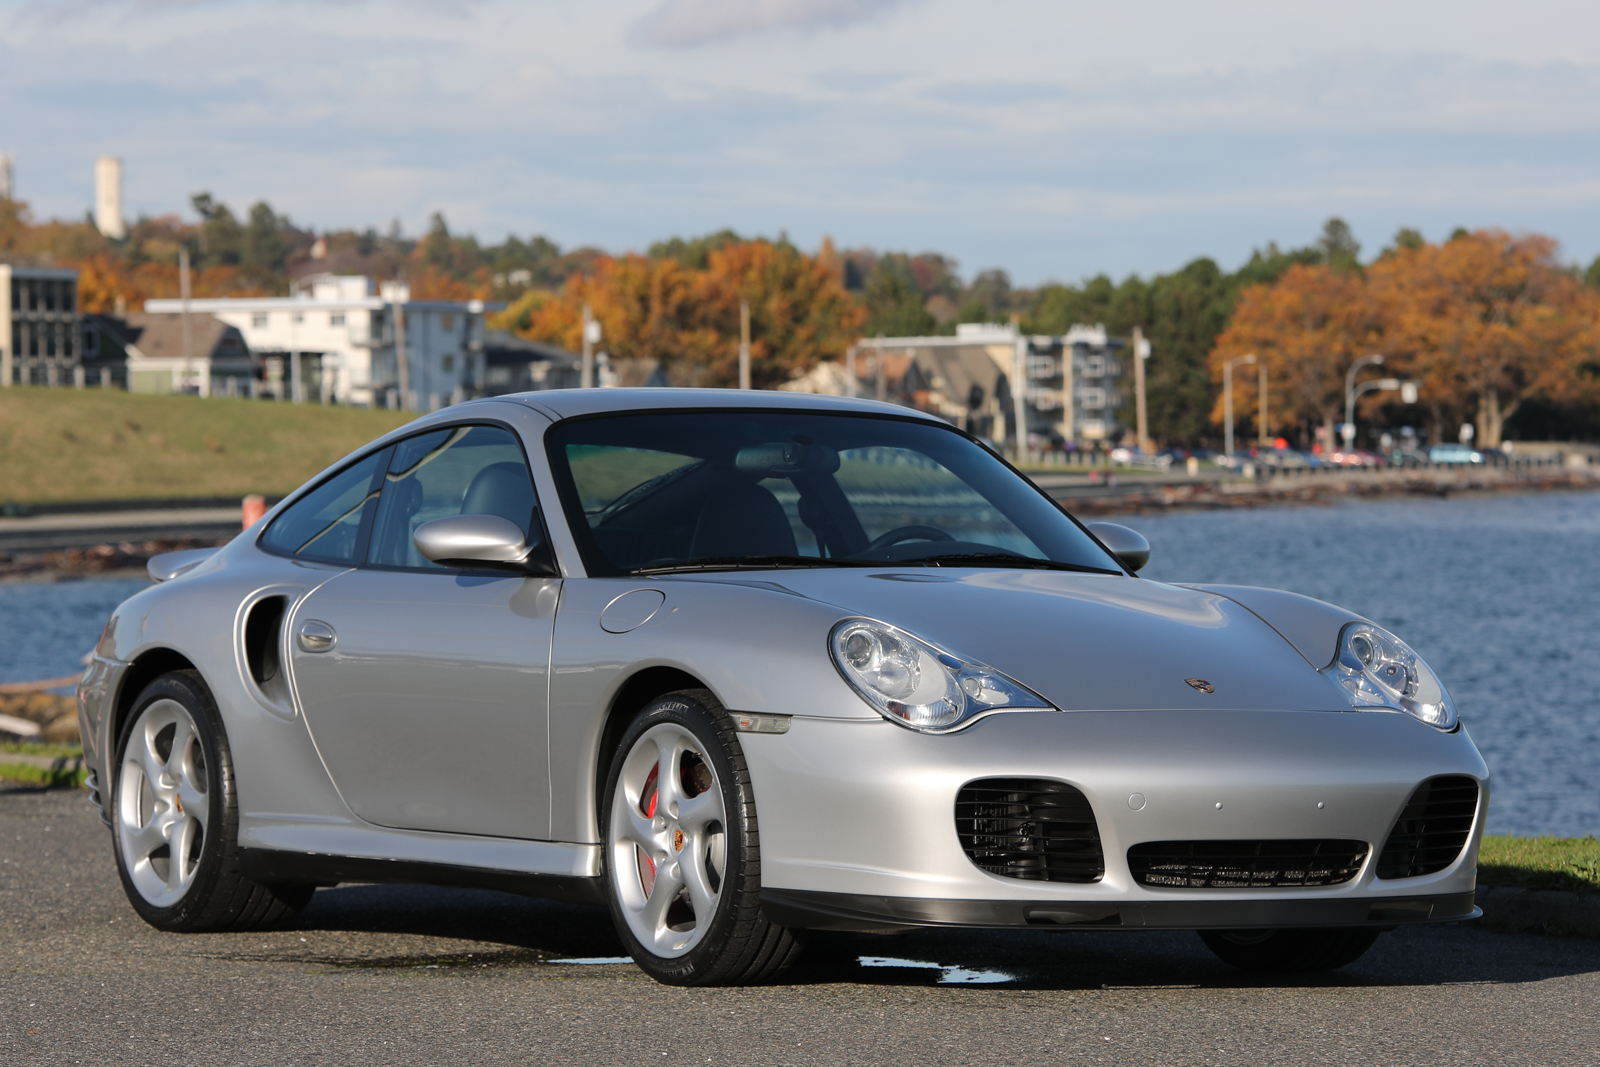 All Types 2003 911 : 2003 Porsche 911 Turbo (996) For Sale | Silver Arrow Cars Ltd